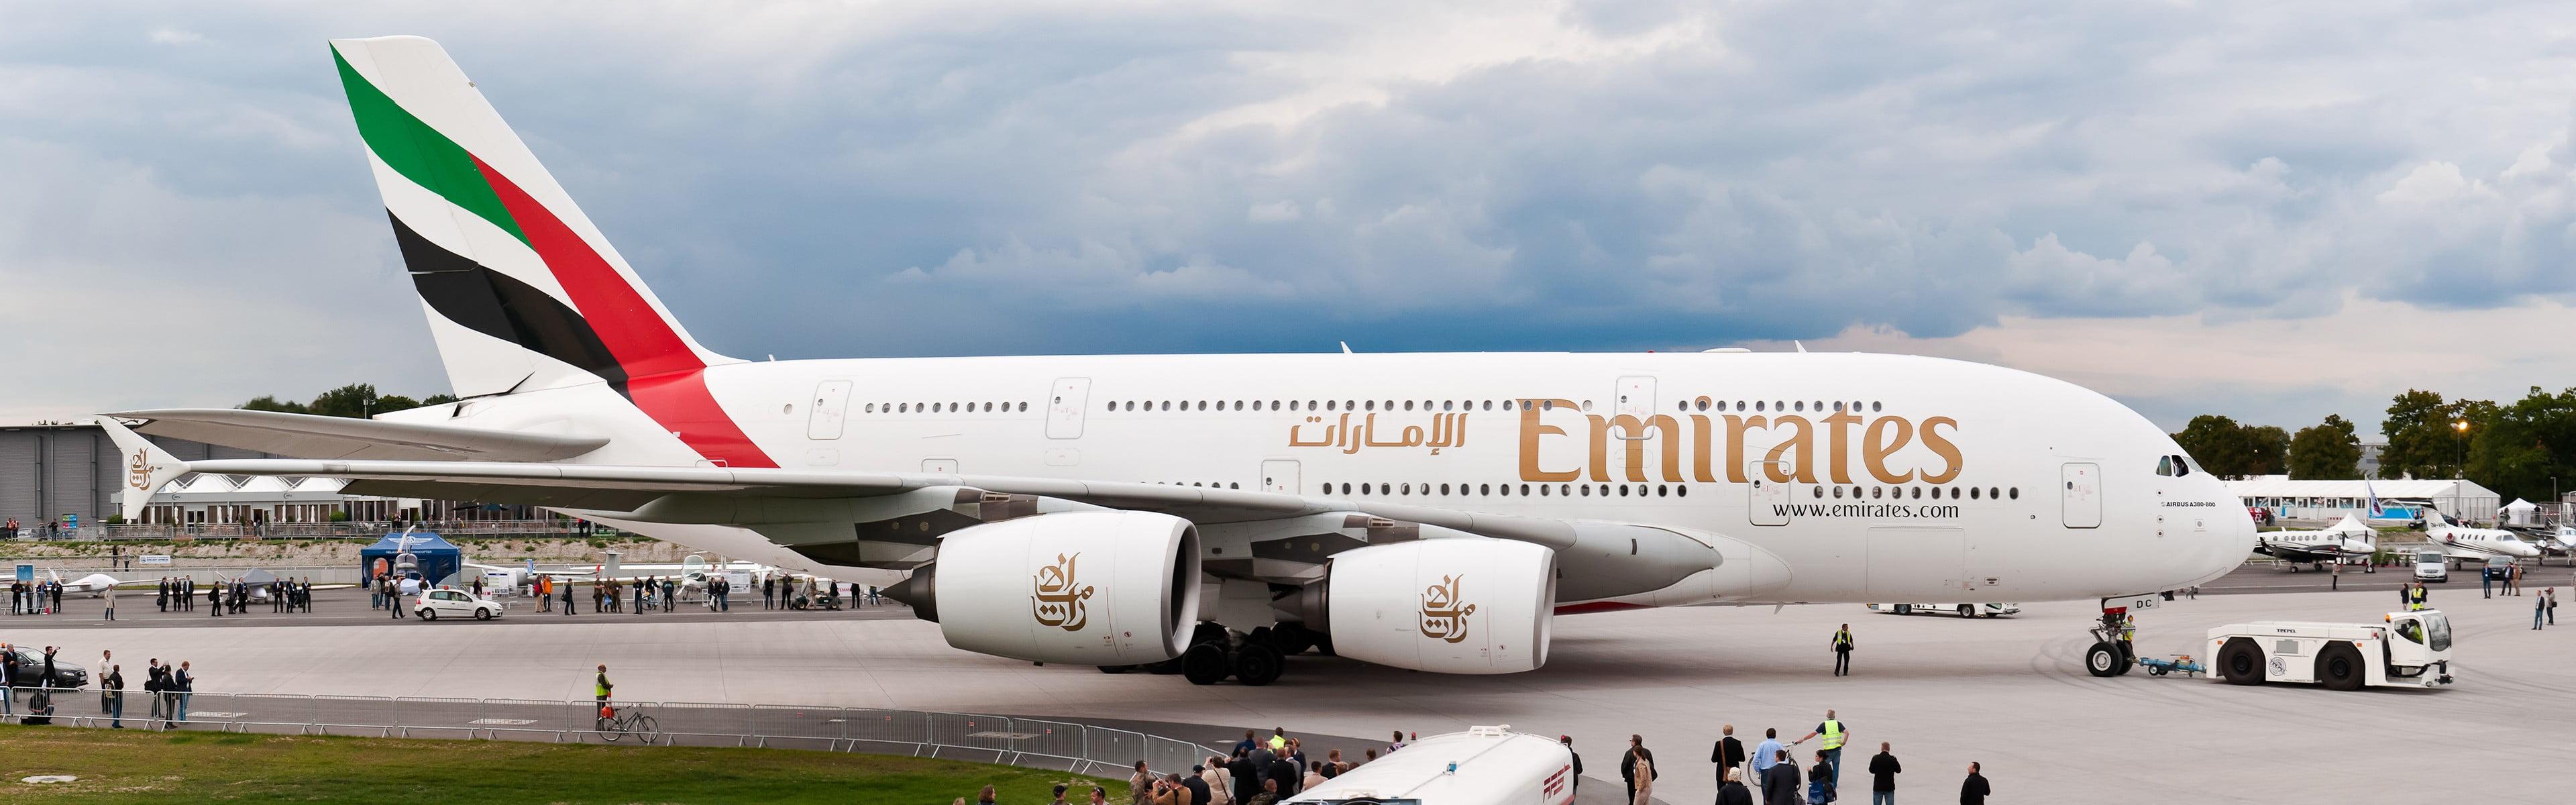 United Arab Emirates plane Emirates A380 aircraft airplane HD 3840x1200